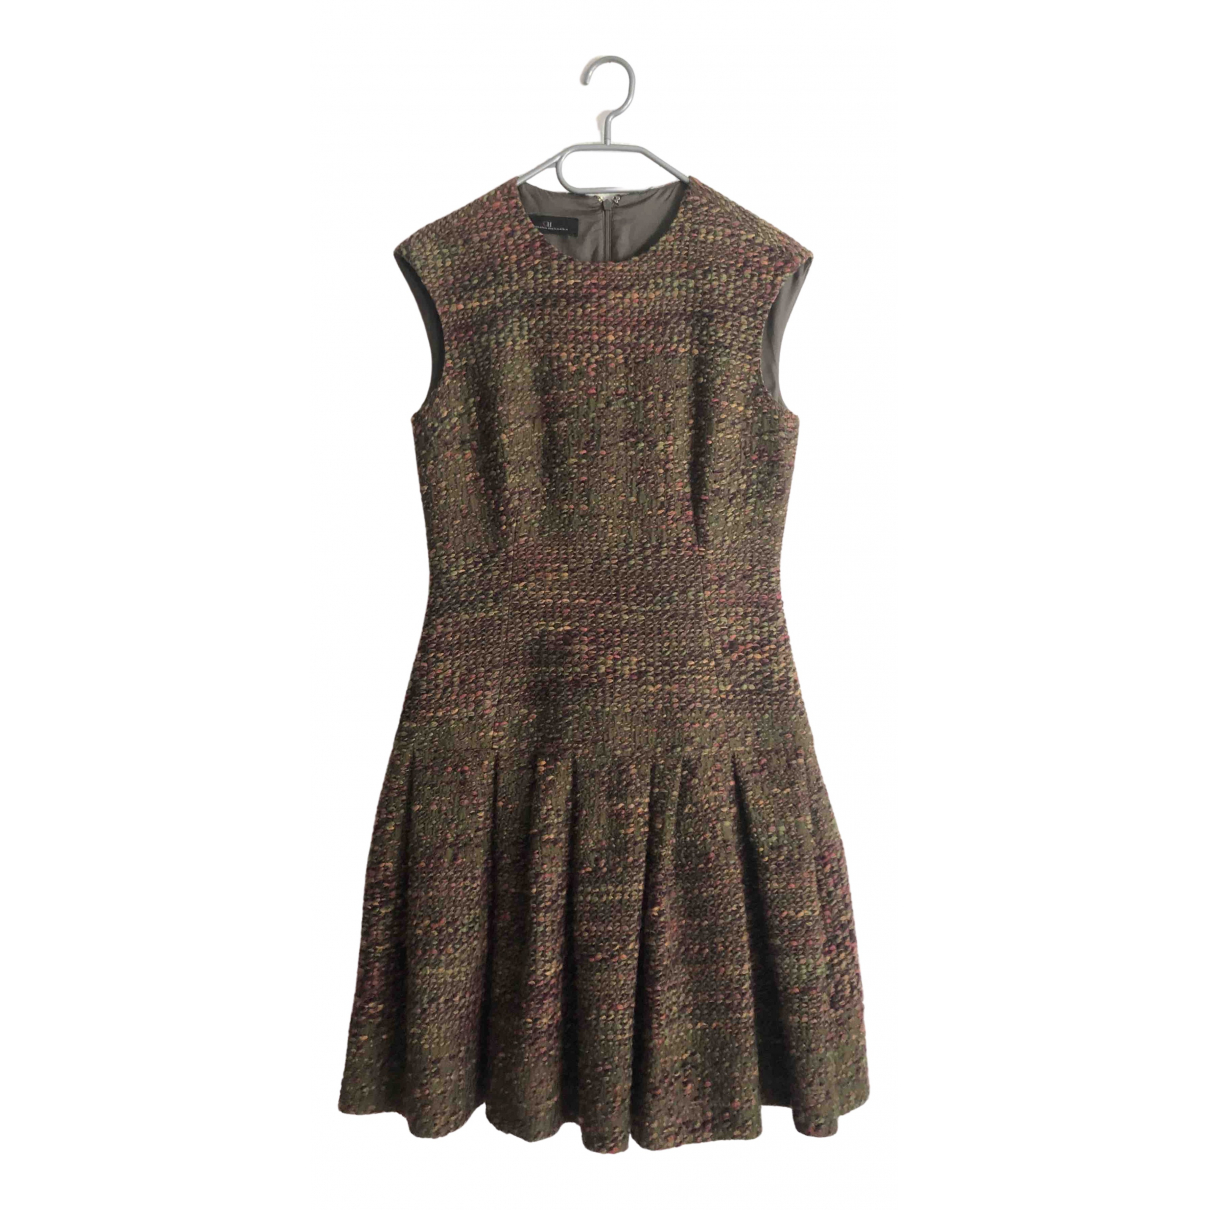 Carolina Herrera \N Kleid in  Khaki Wolle